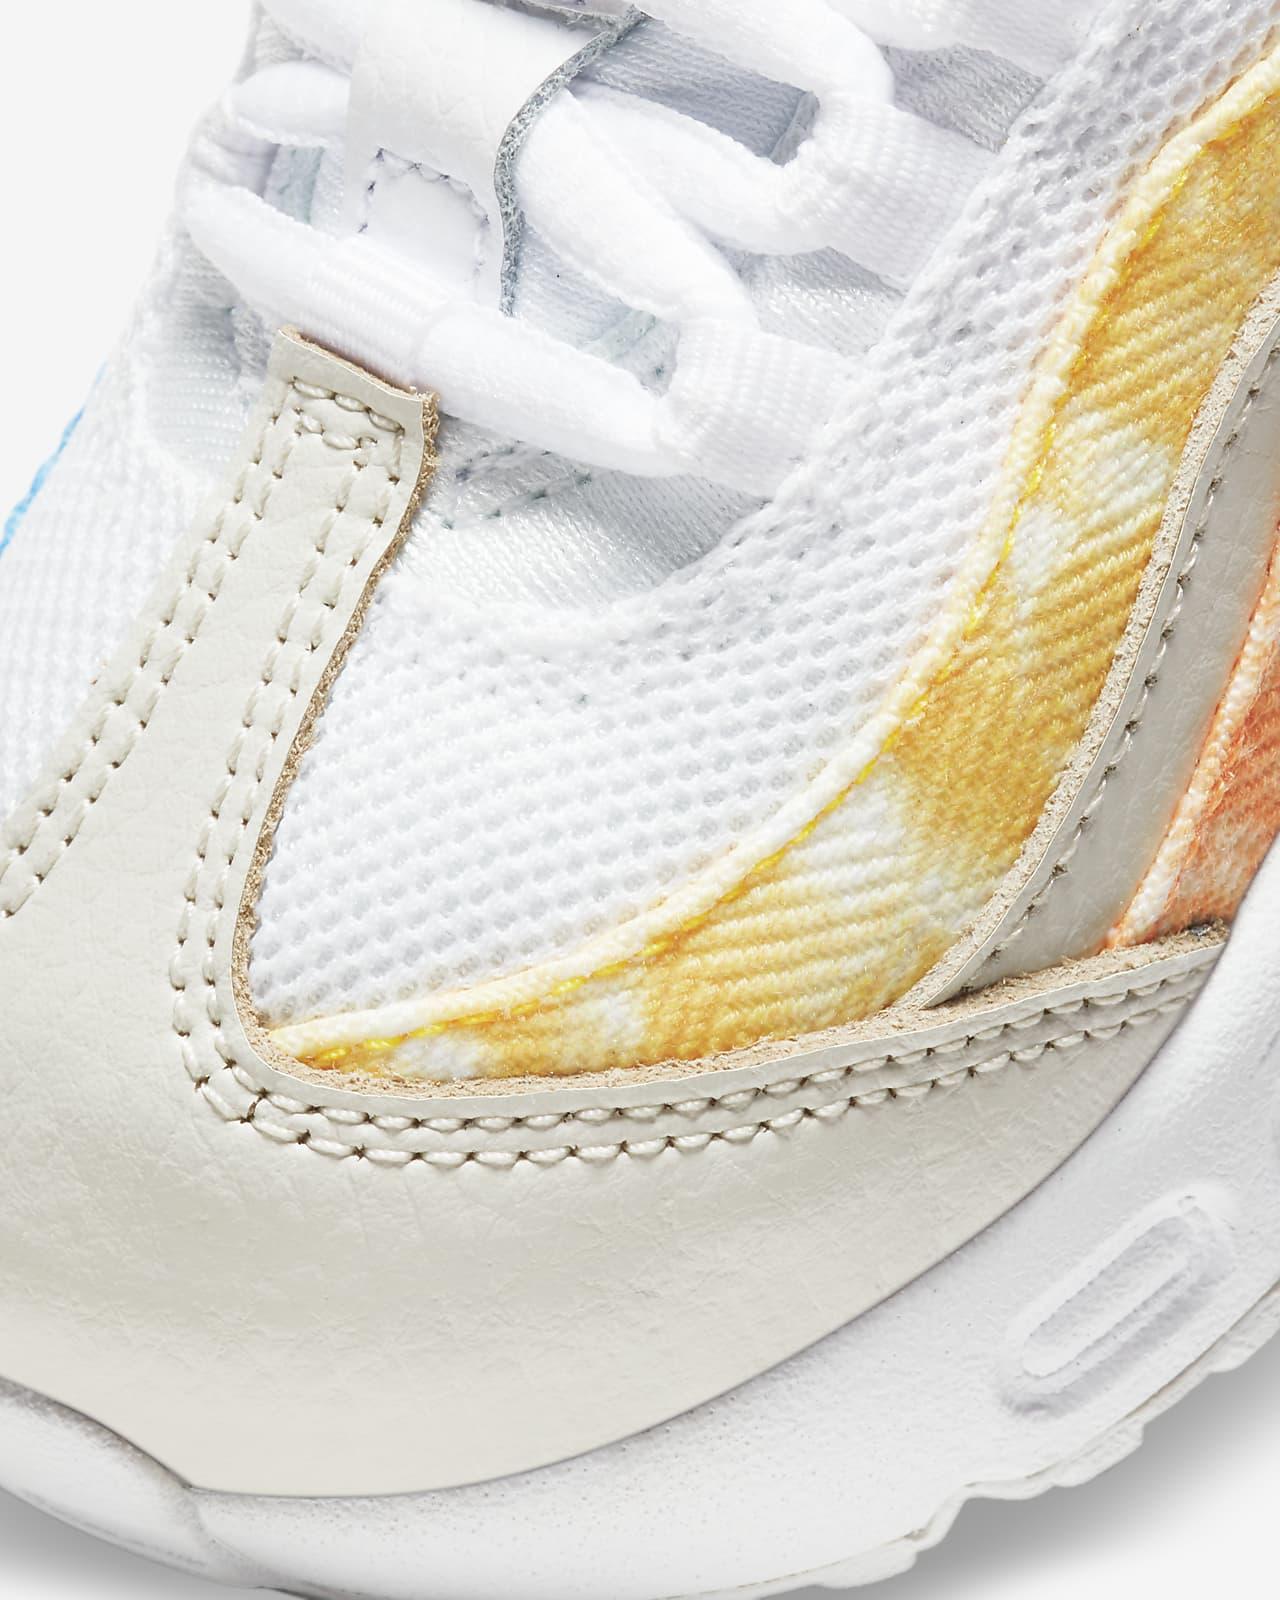 Scarpa Nike Air Max 95 - Neonati/Bimbi piccoli